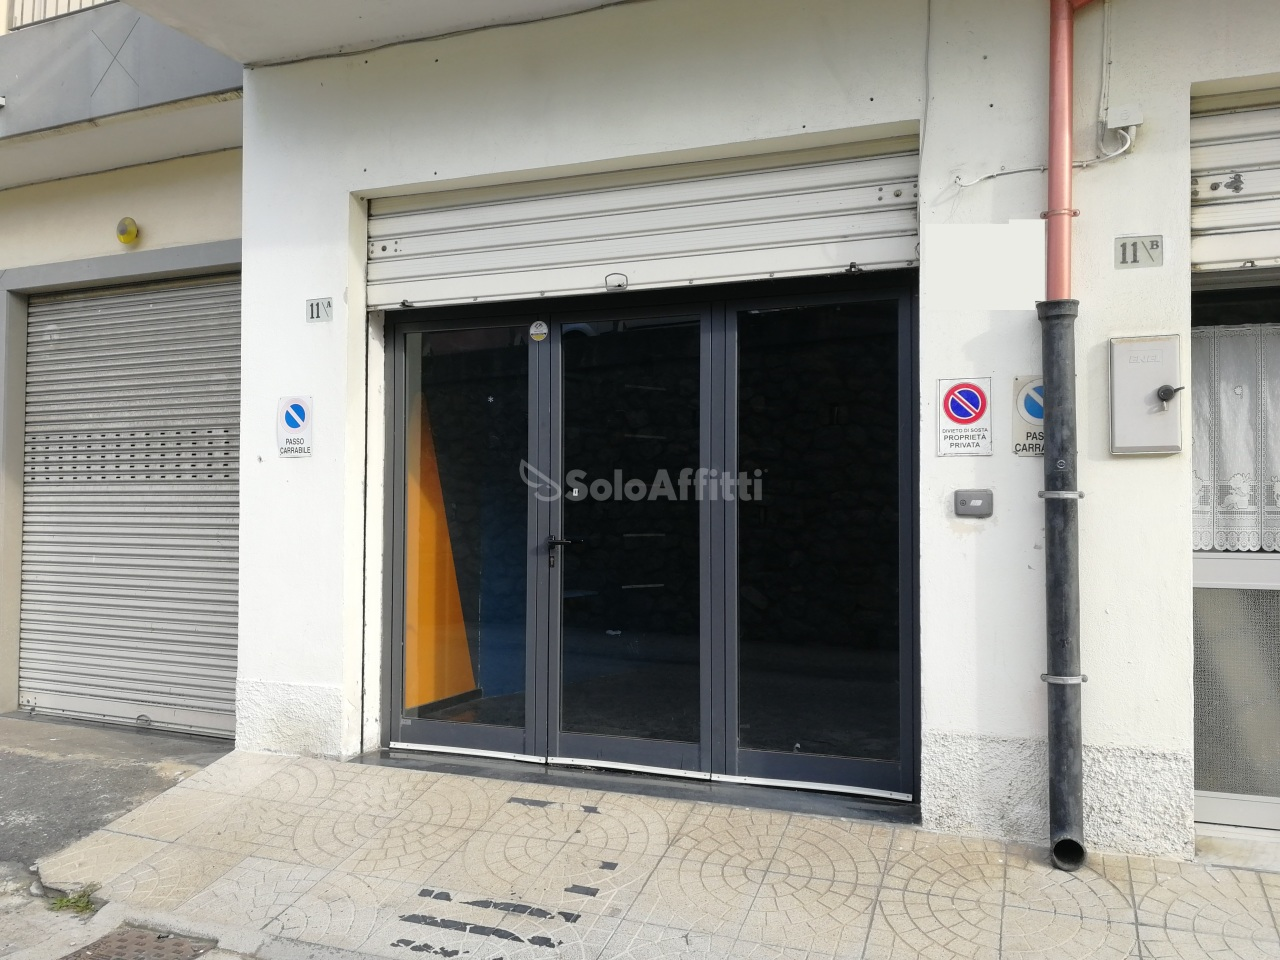 Fondo/negozio - 1 vetrina/luce a Lido Corso, Catanzaro